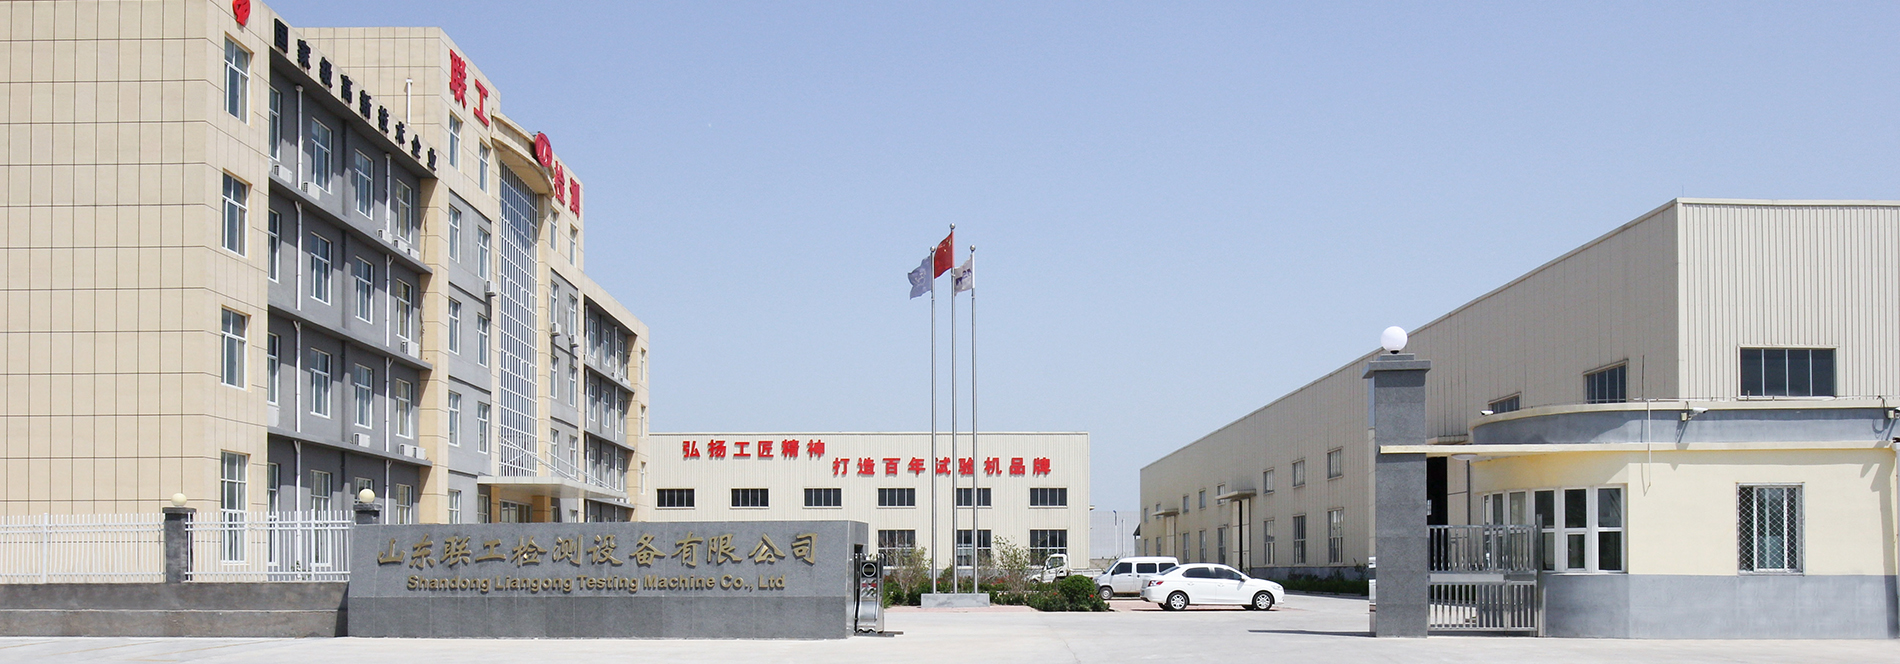 Завод Liangong общий вид 1